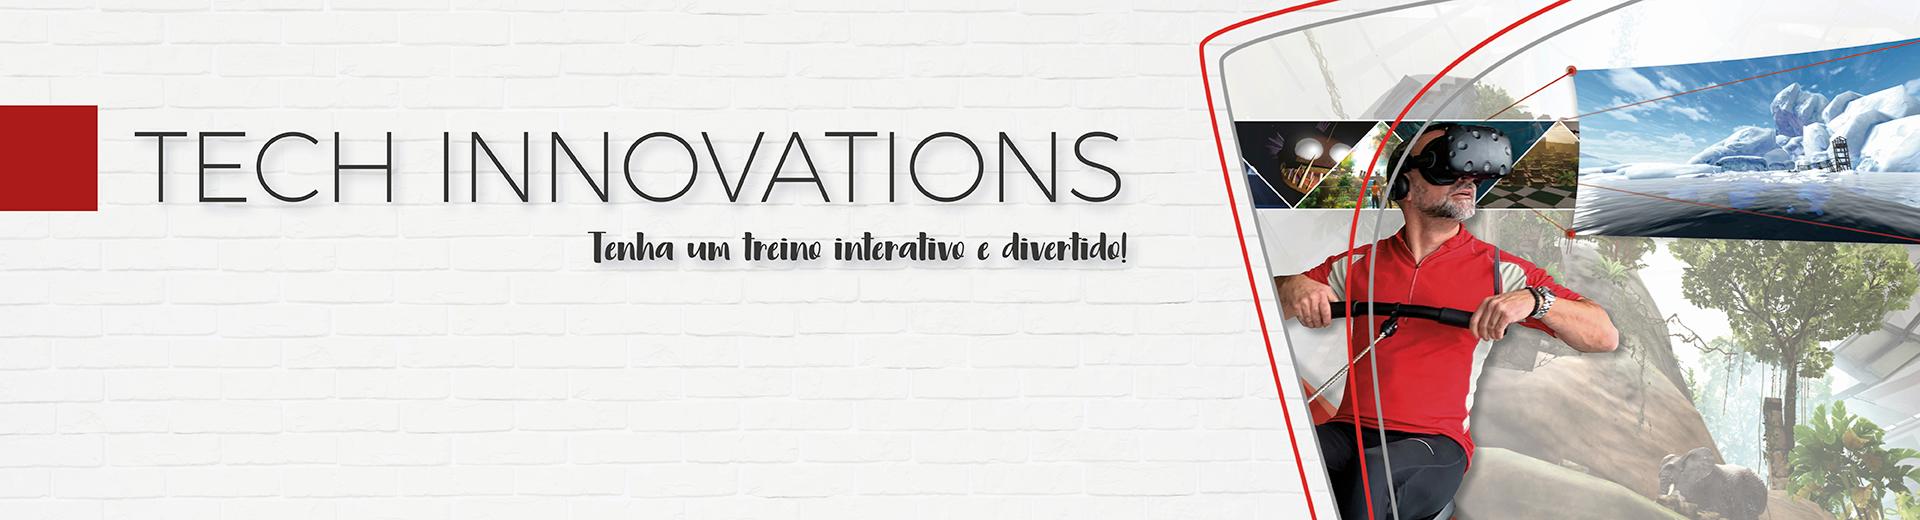 Categoria Tech Innovation